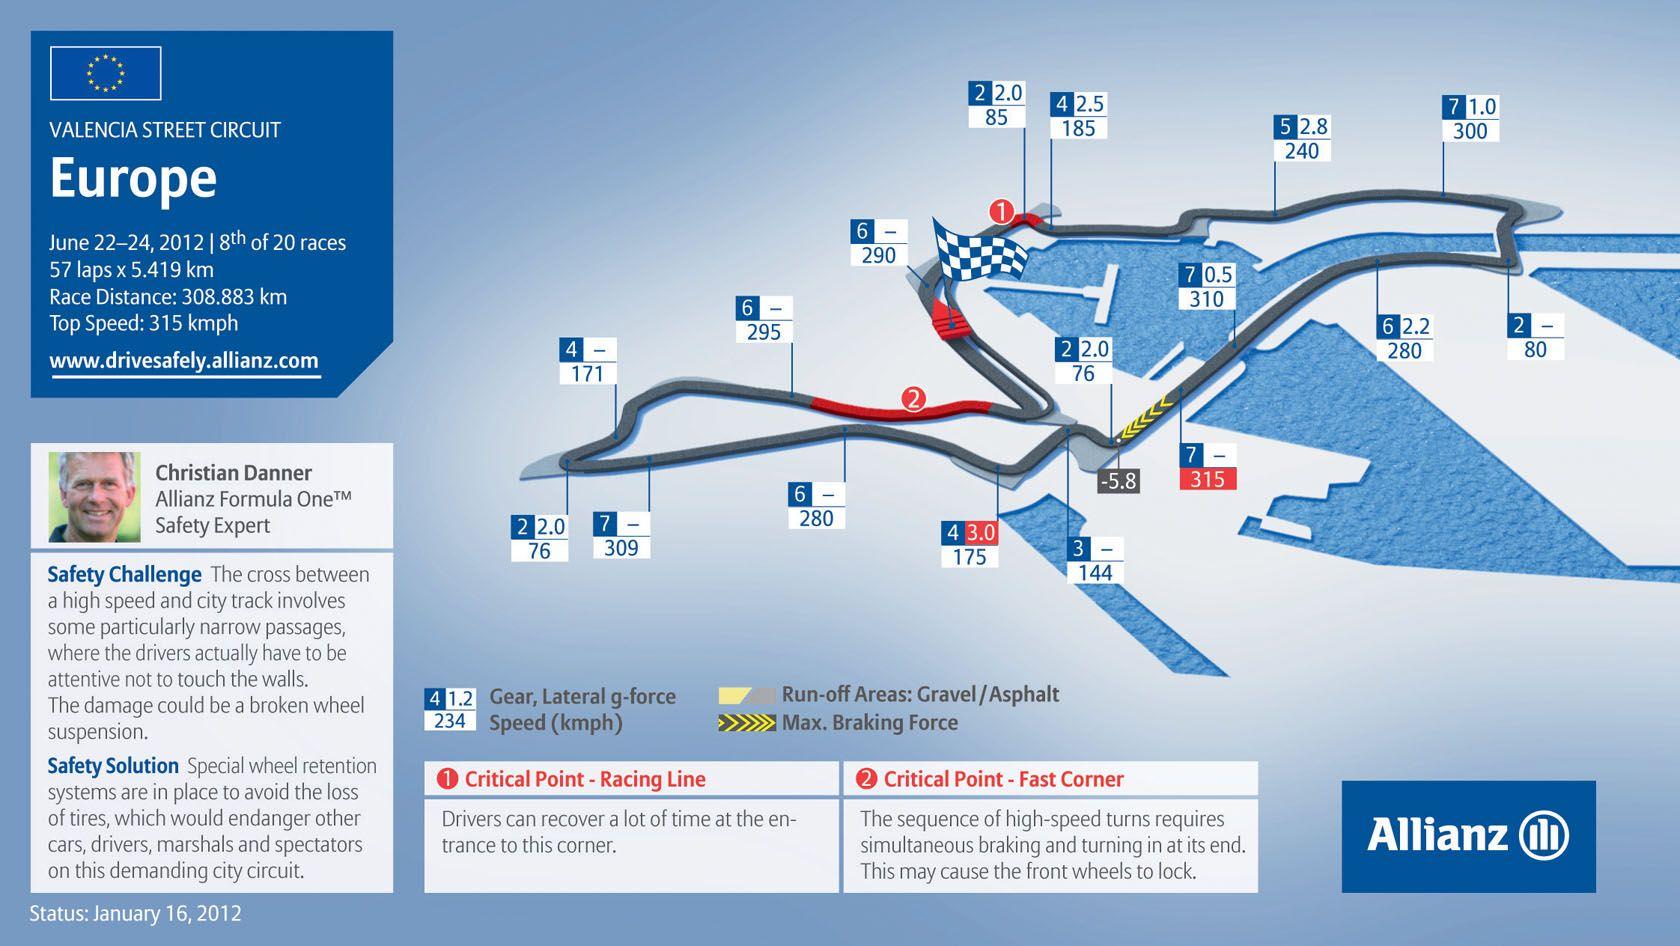 Circuito Valencia F1 : European grand prix valencia street circuit valencia spain